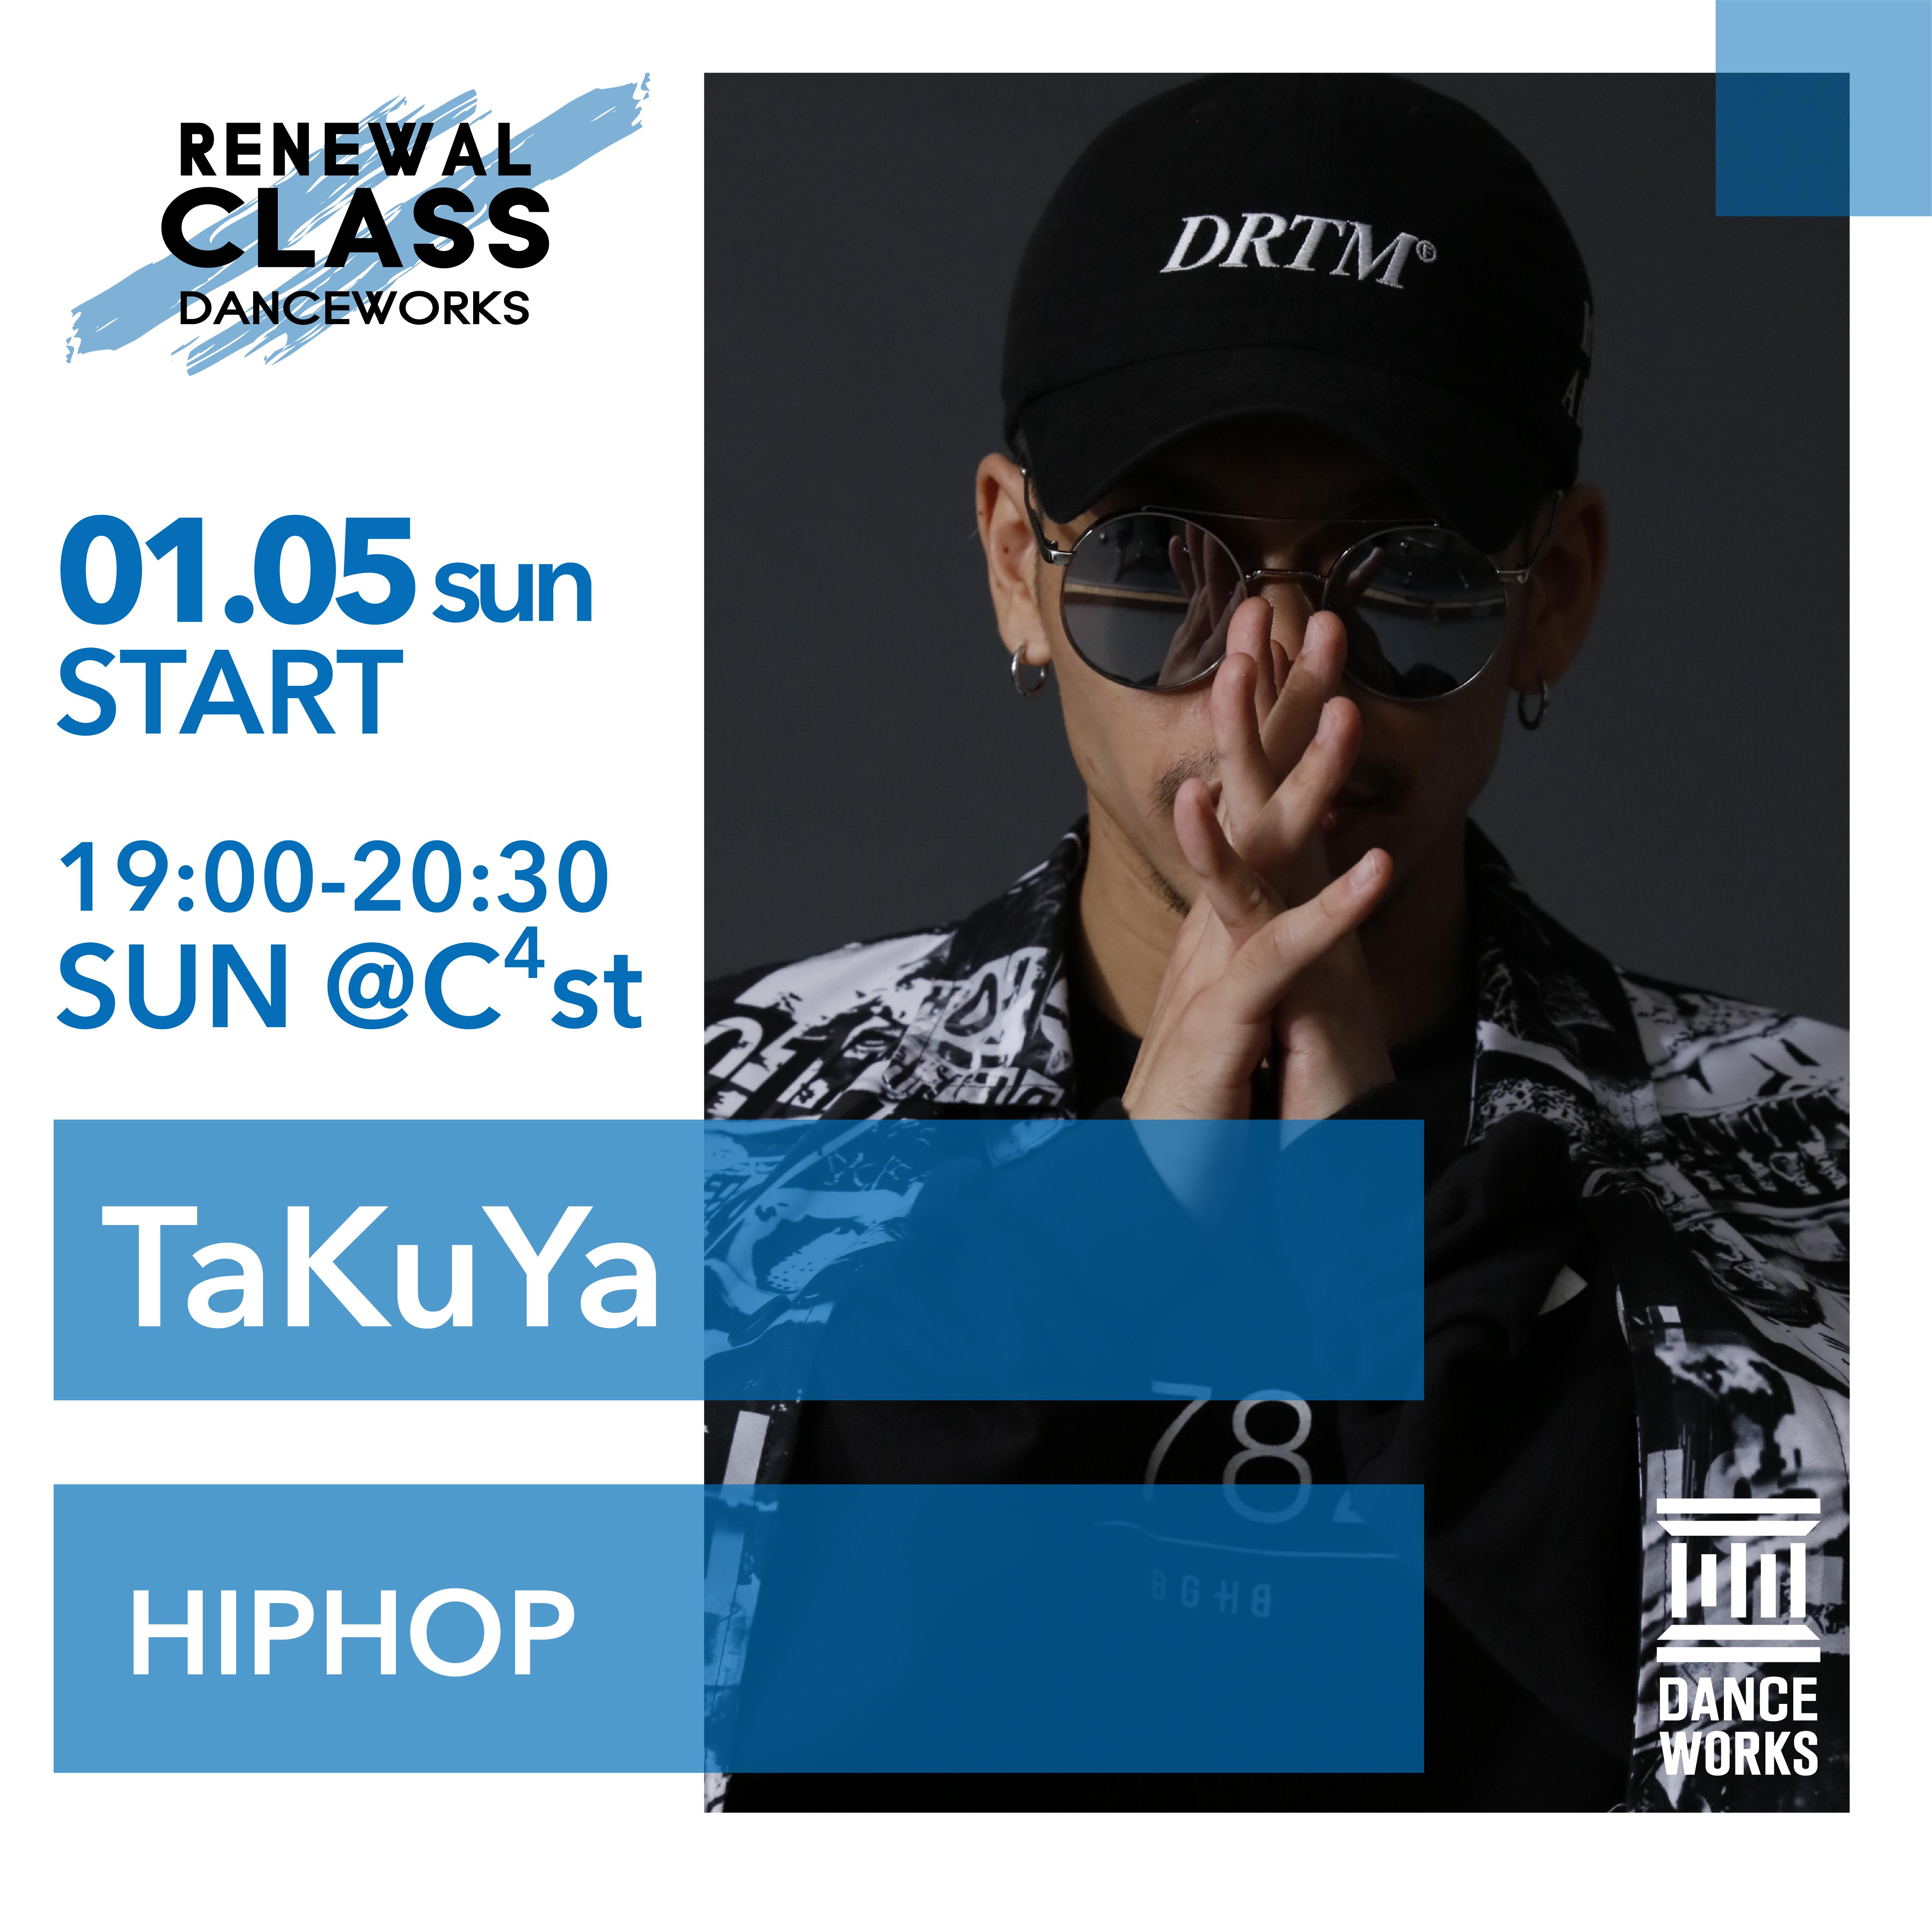 19.12_renewal_TaKuYa-01